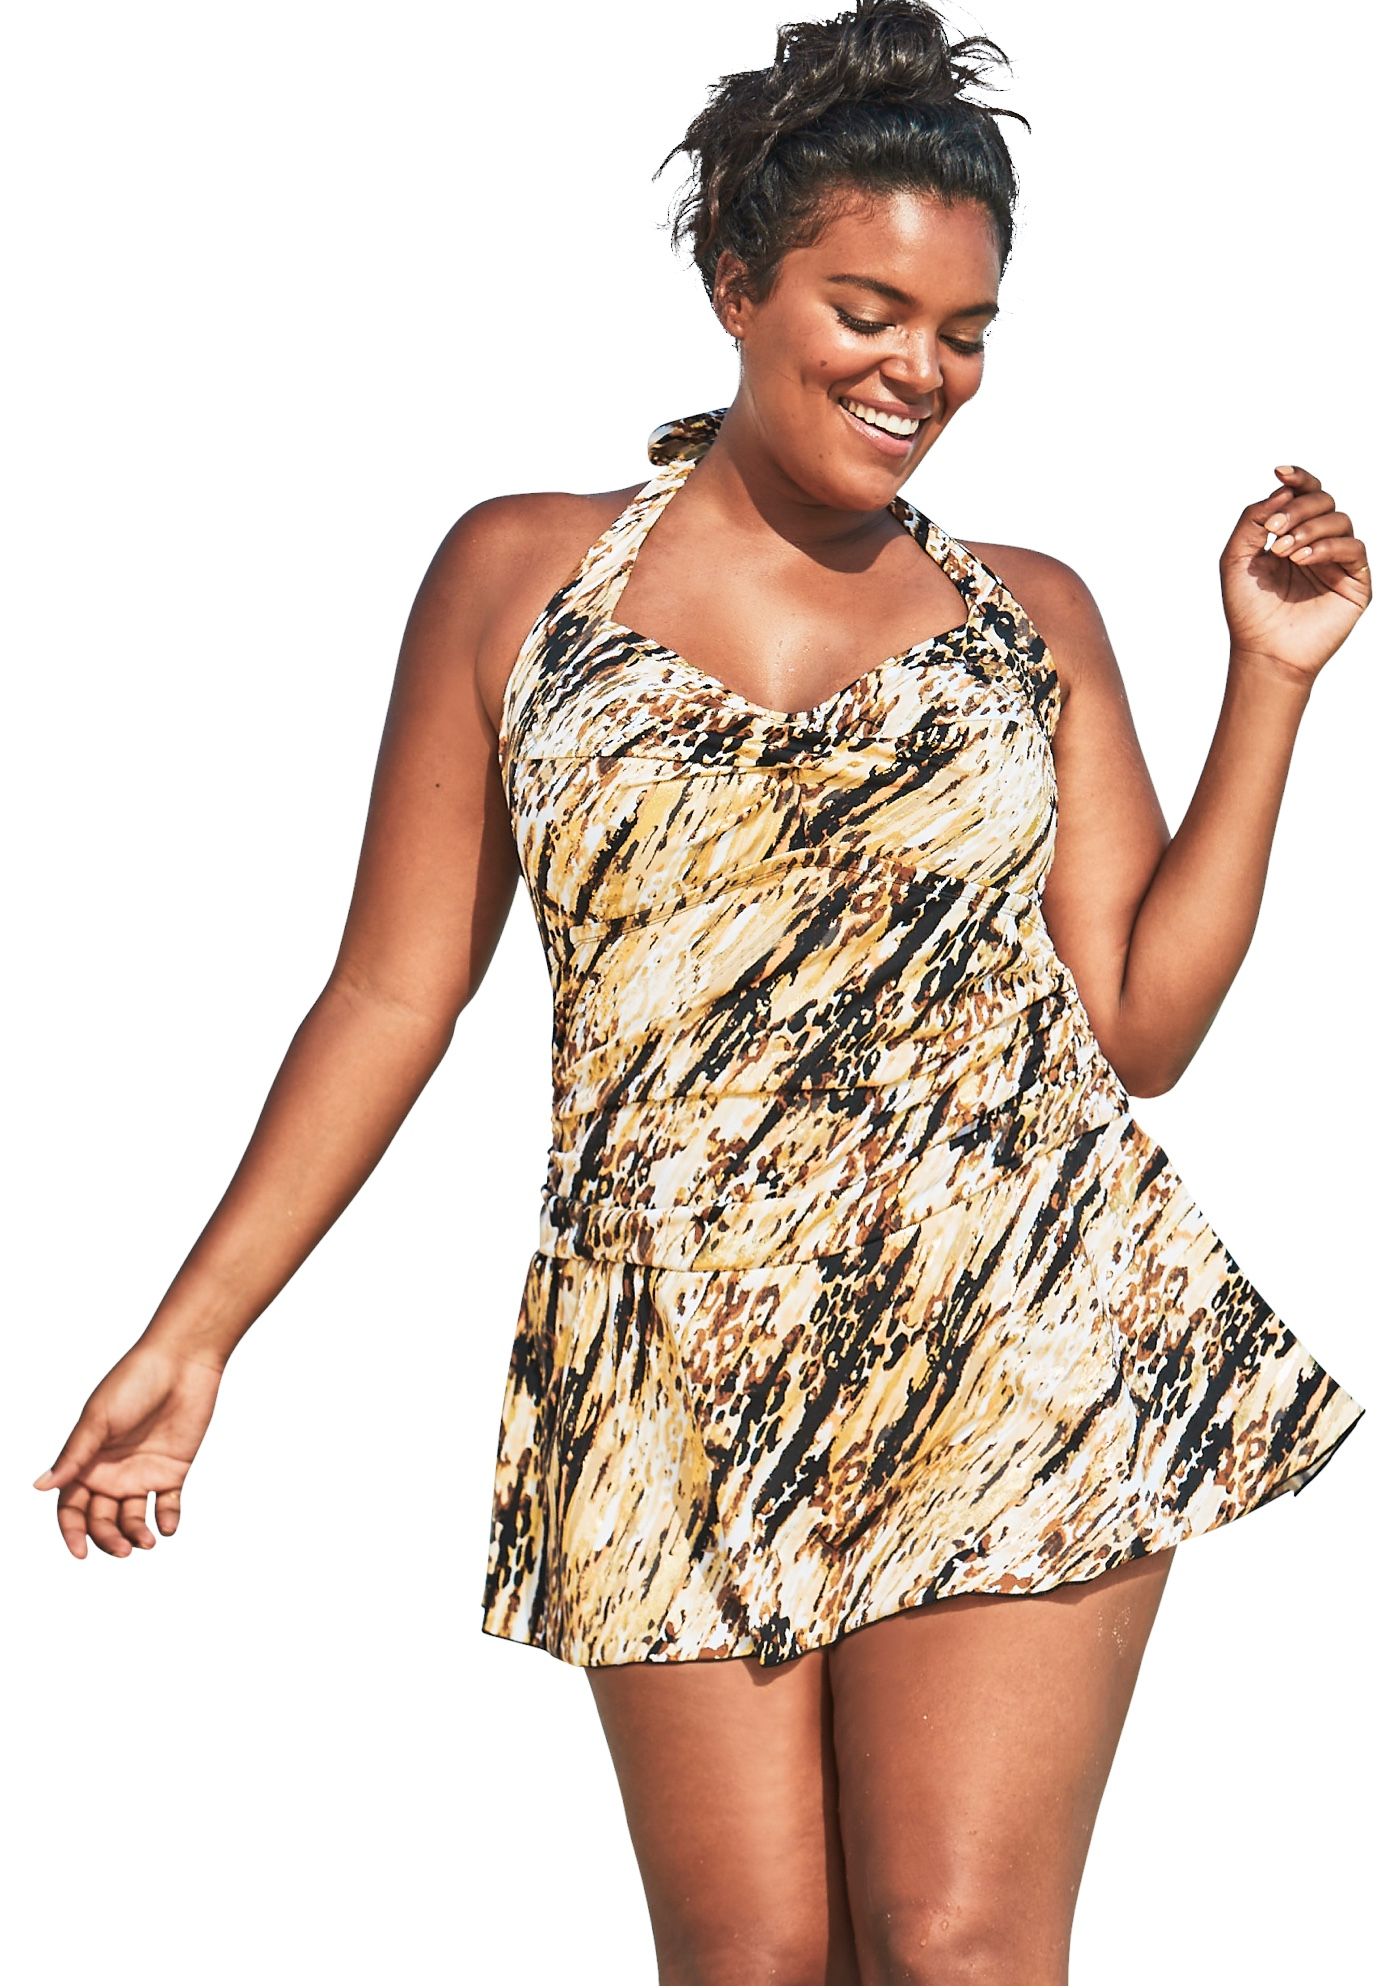 Plus Size Women's Retro Halter Swim Dress by Swim 365 in Brown Animal Tie Dye